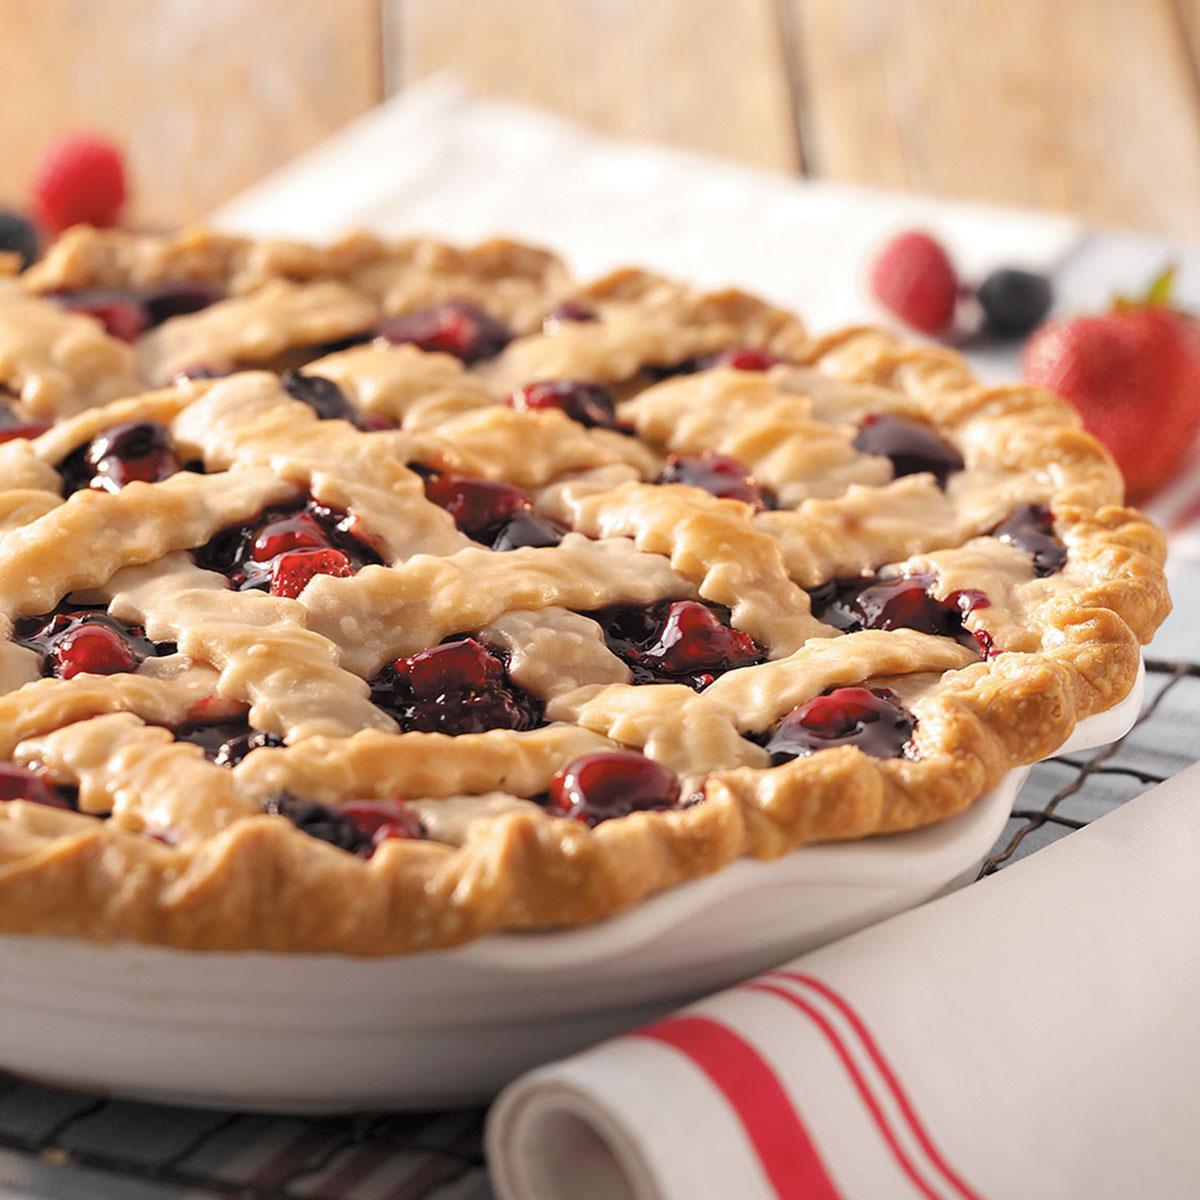 Fruit Pie Recipes  Mixed Berry Pie Recipe